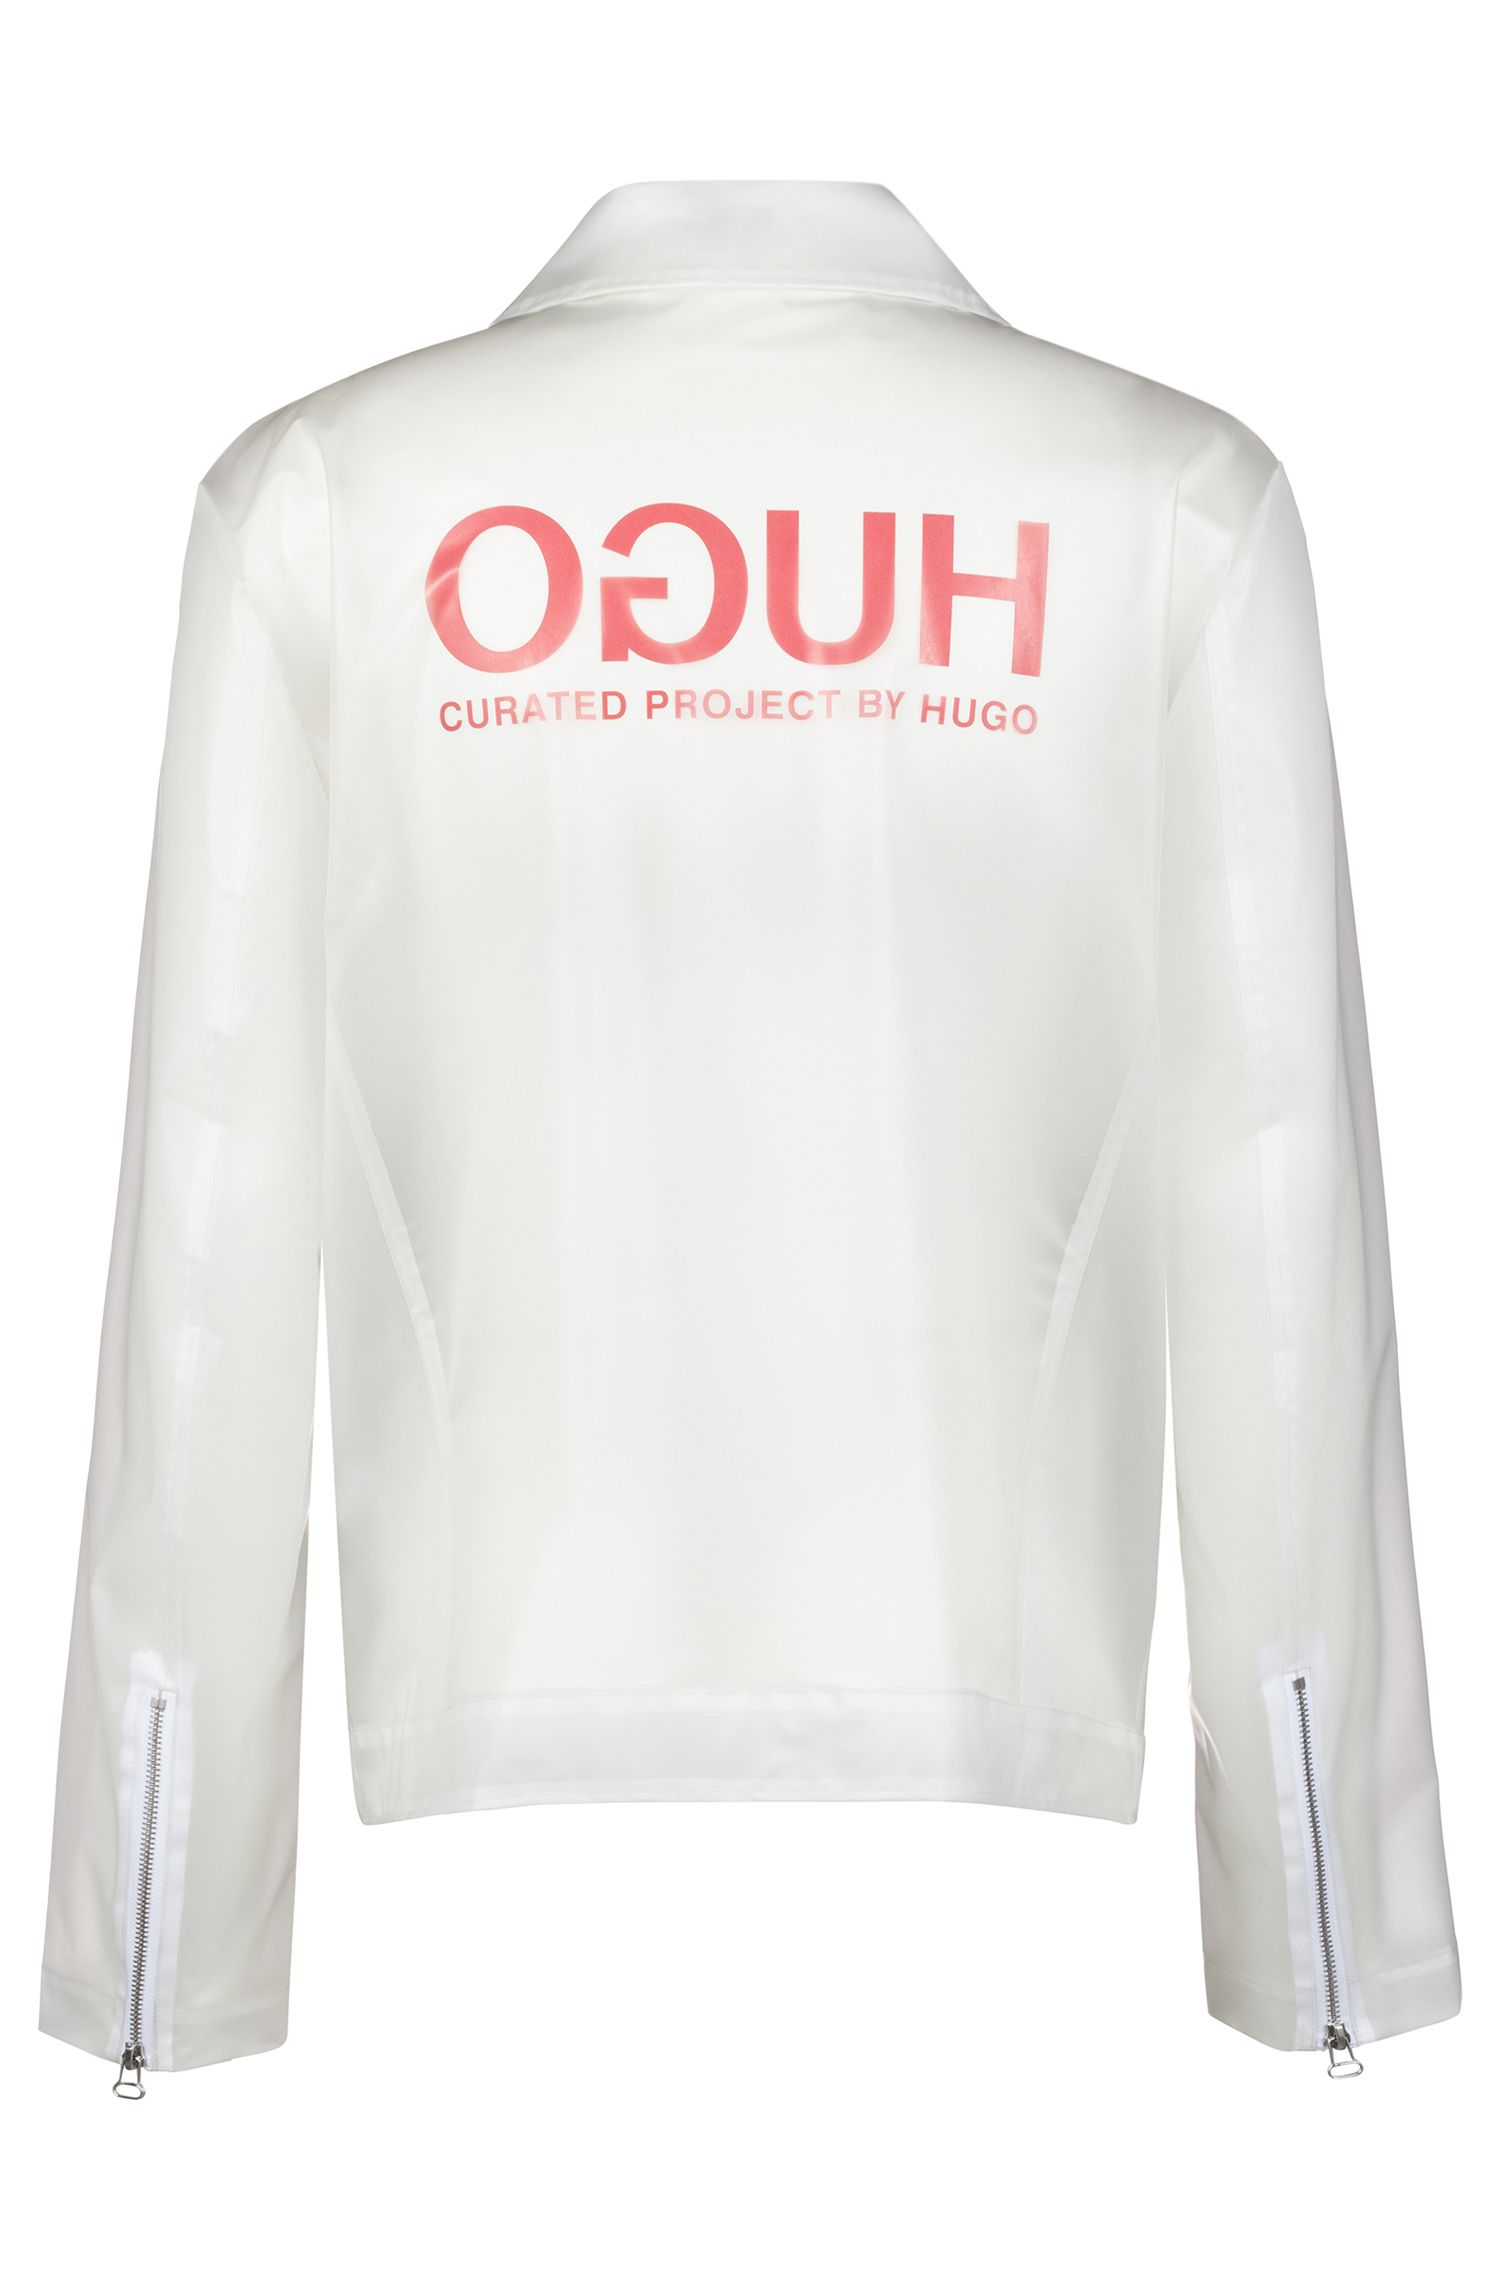 Unisex biker-style logo jacket in transparent material, Transparent